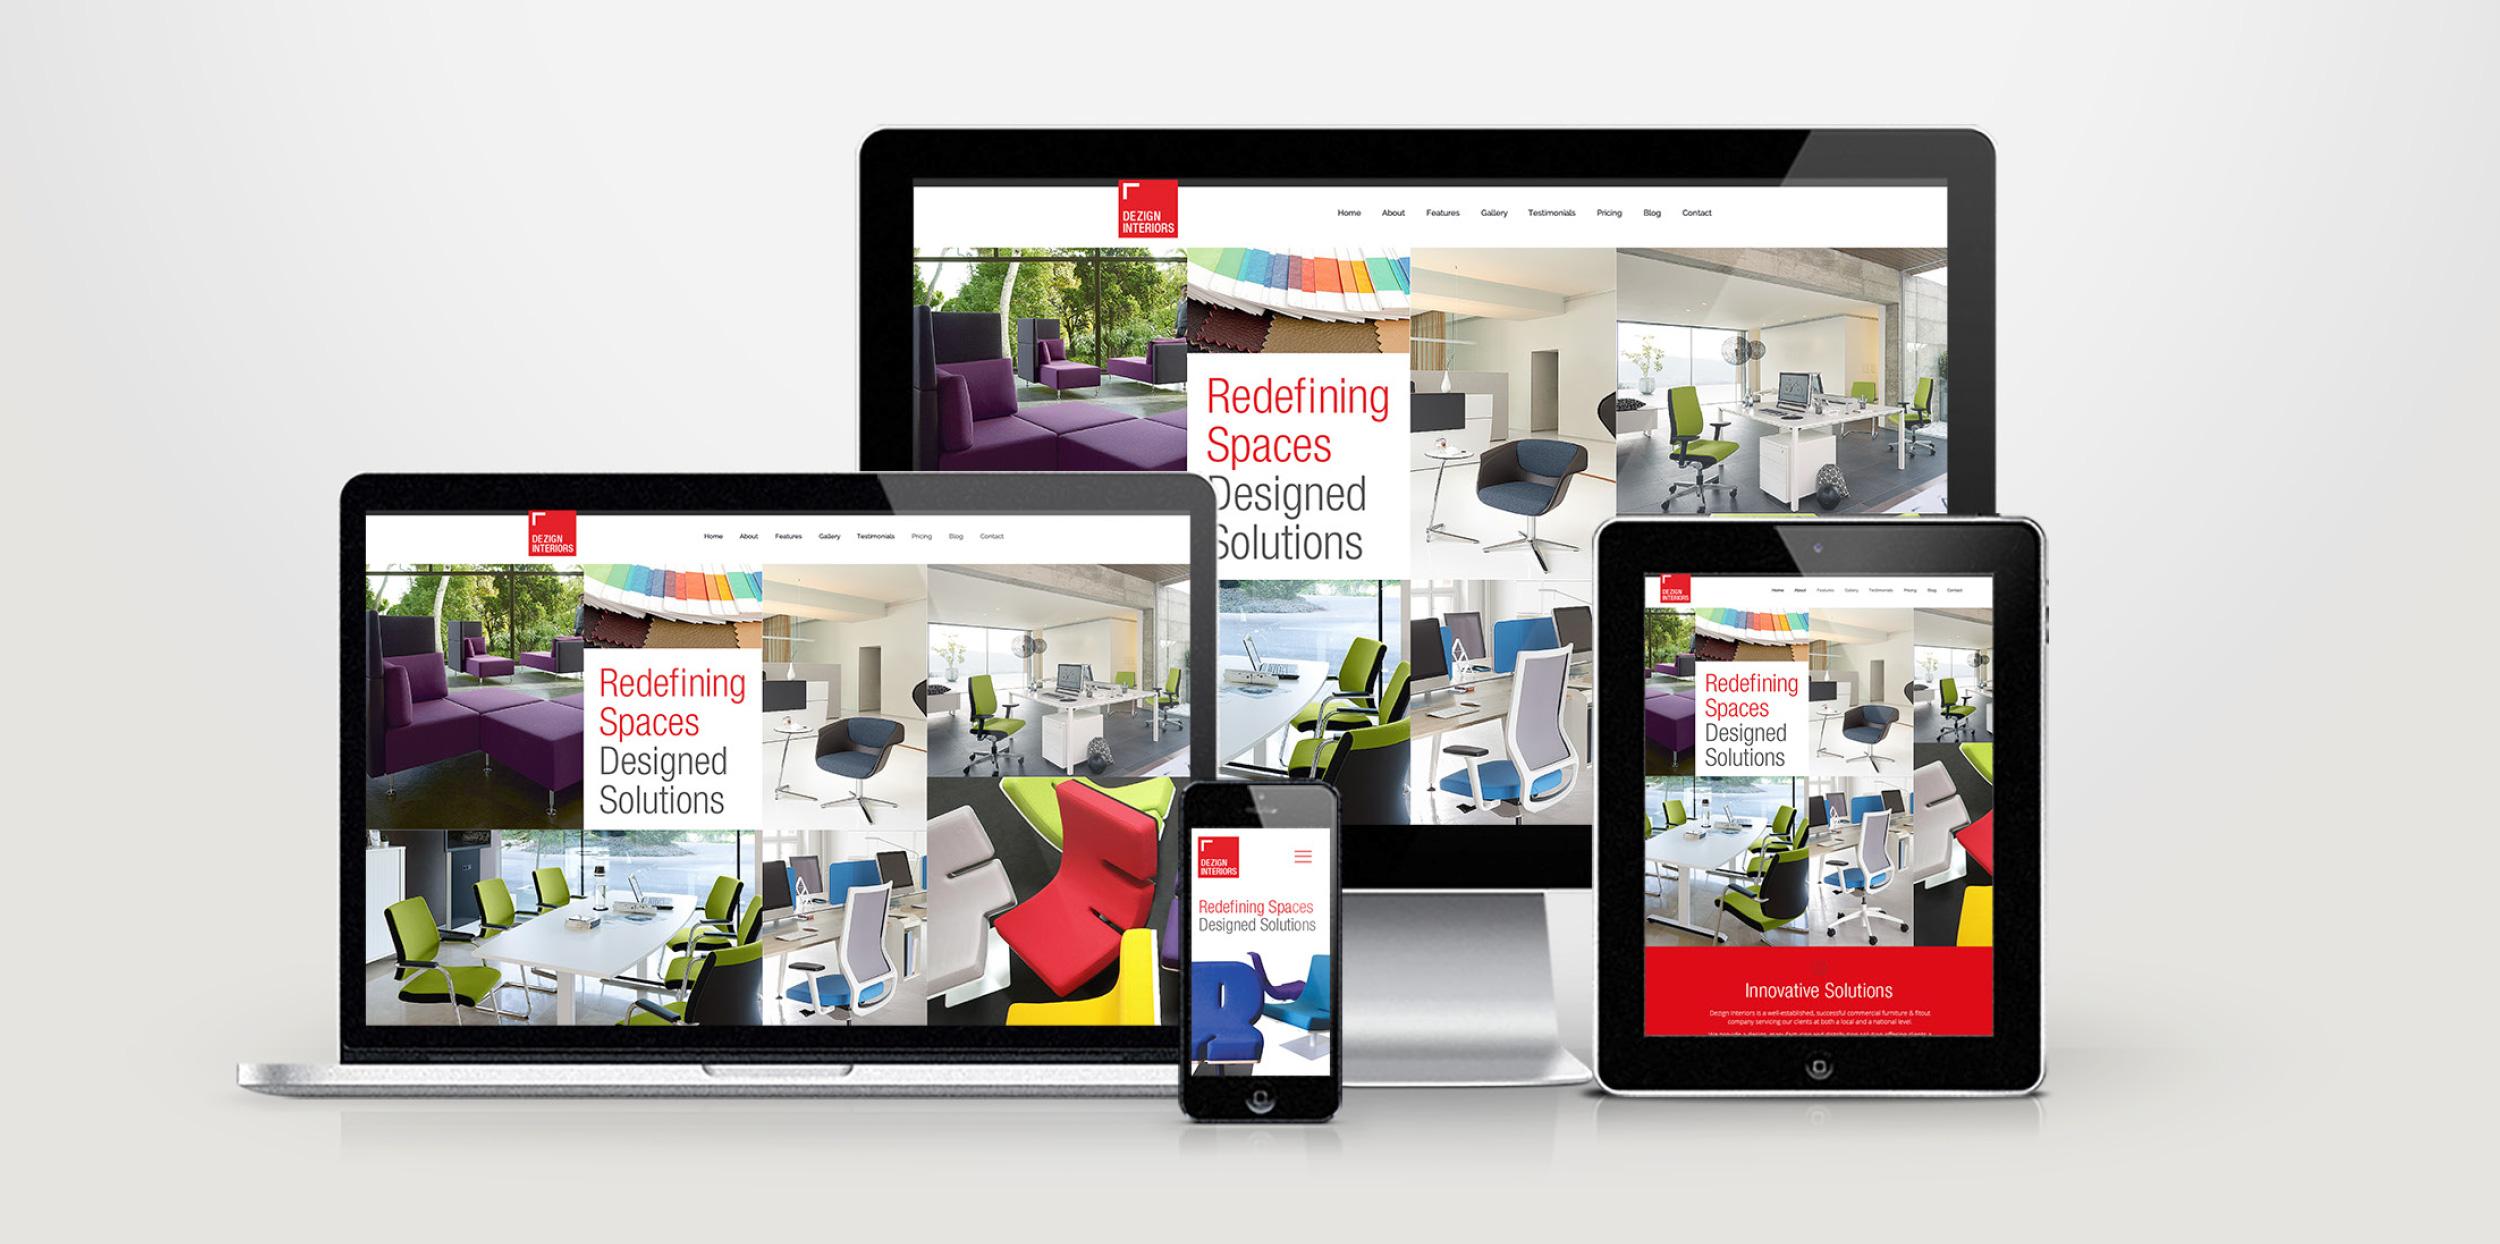 Handle-Sydney-Branding_Dezign-Interiors-Image-10.jpg